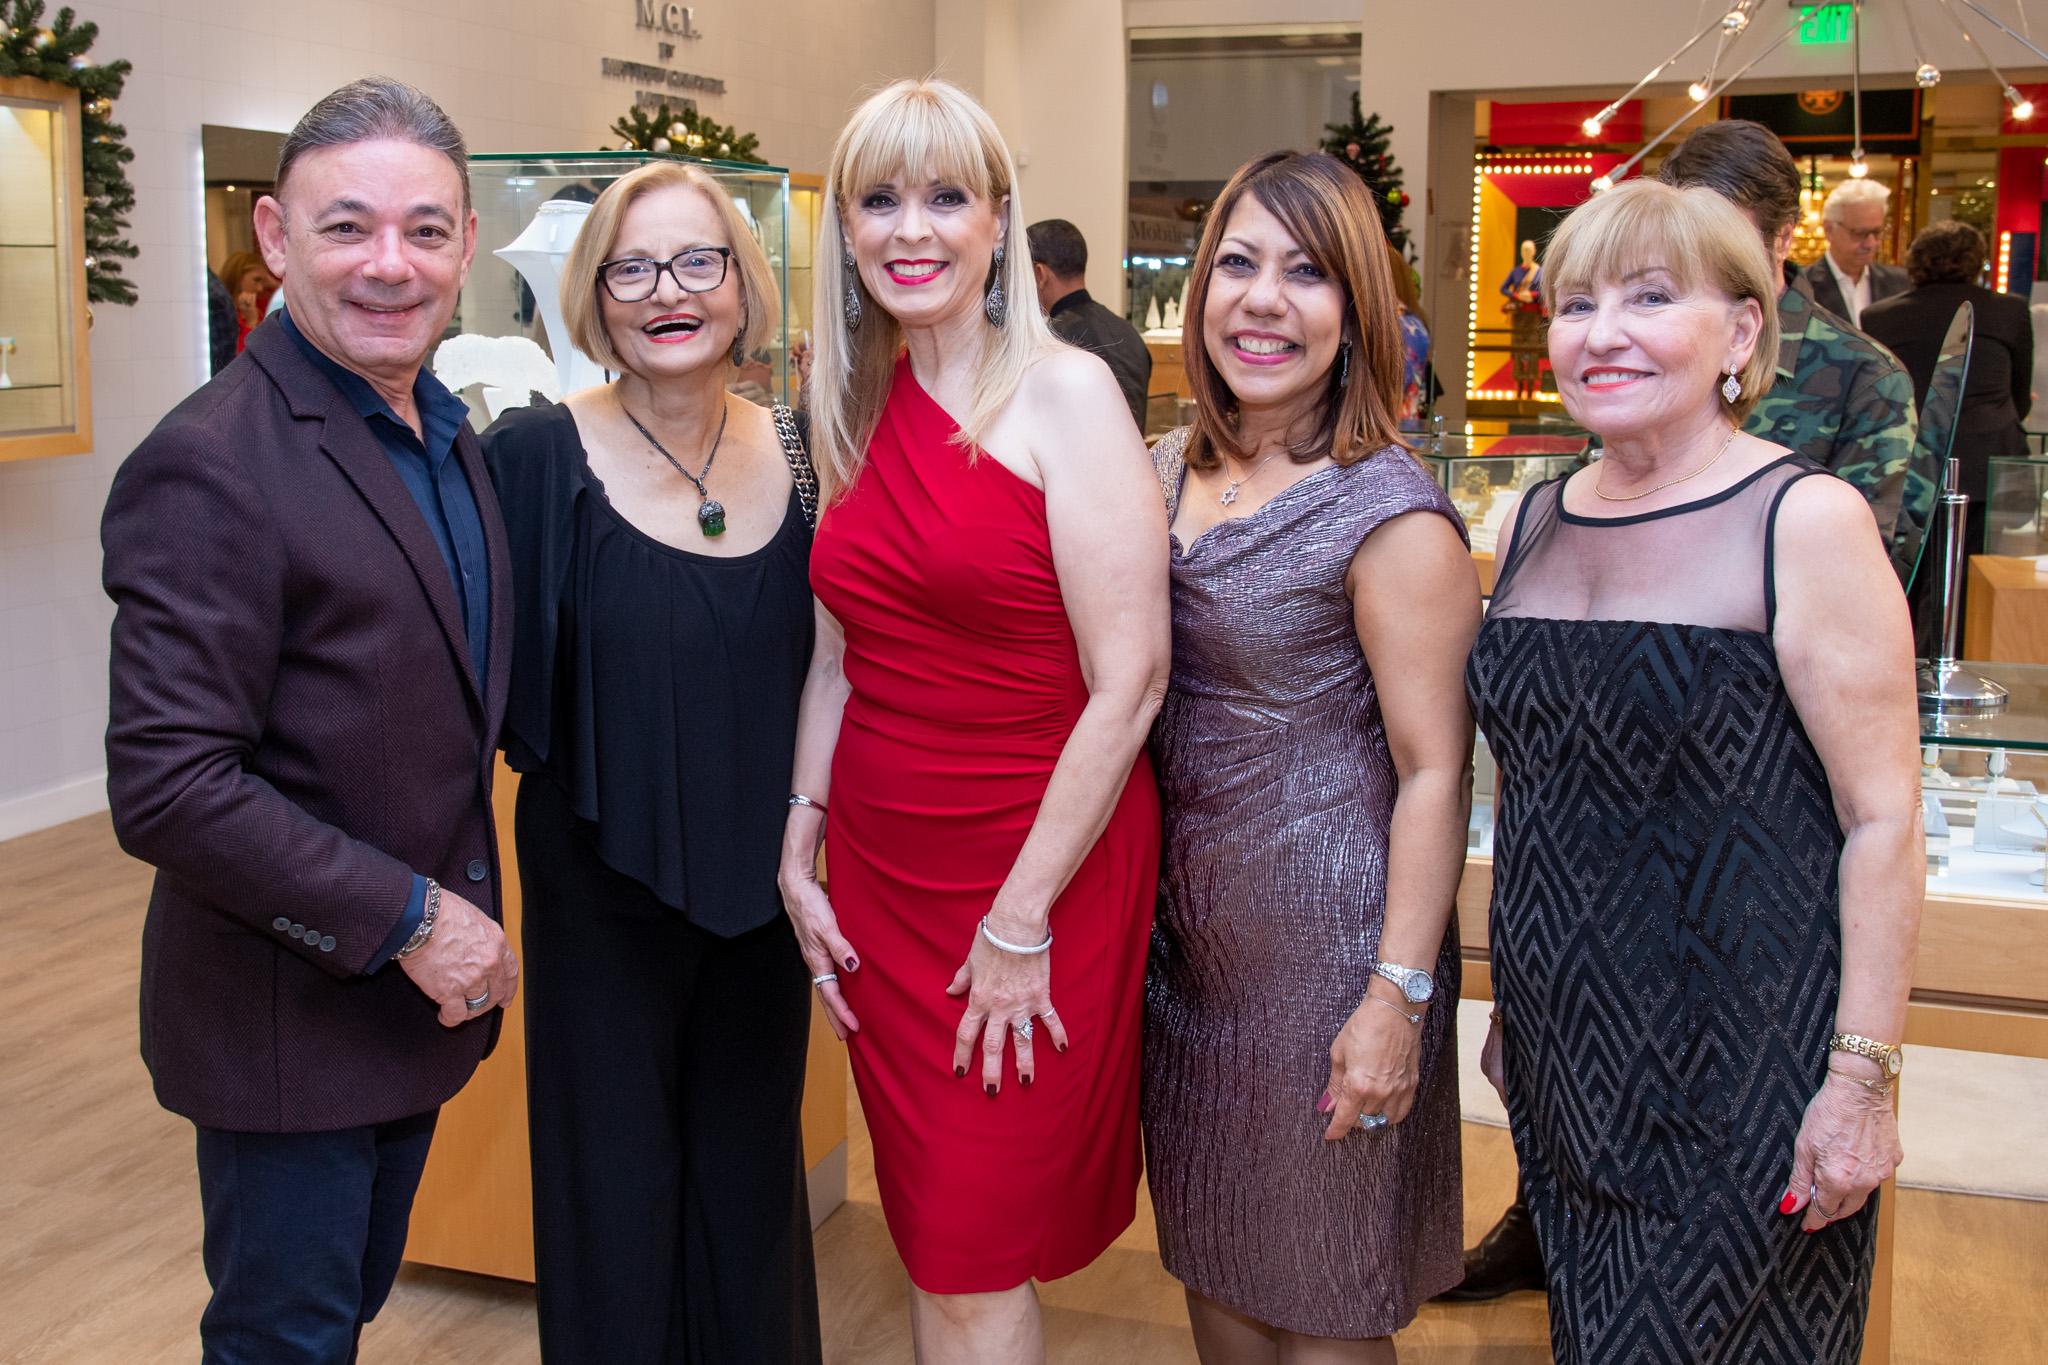 Nicolás Betancourt, Rosadela Varela, Vanessa Olivo, Yolanda Pérez y Maria Hernández. (Suministrada)